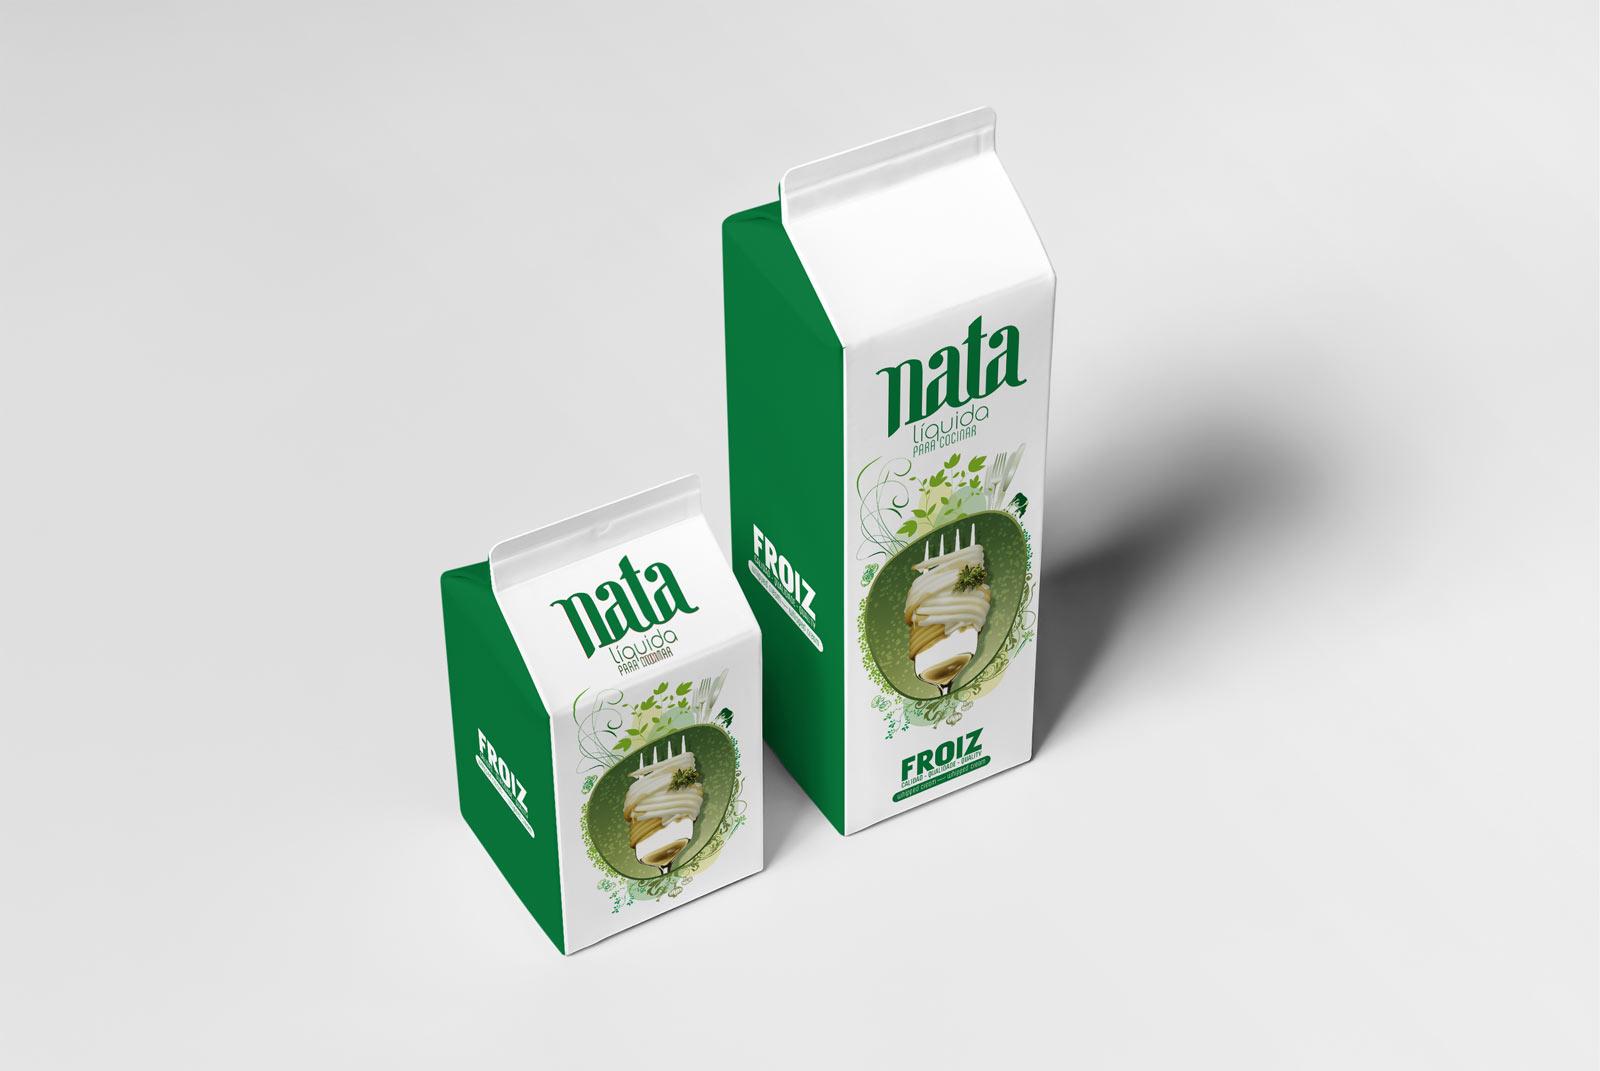 Froiz-nata-packaging-07